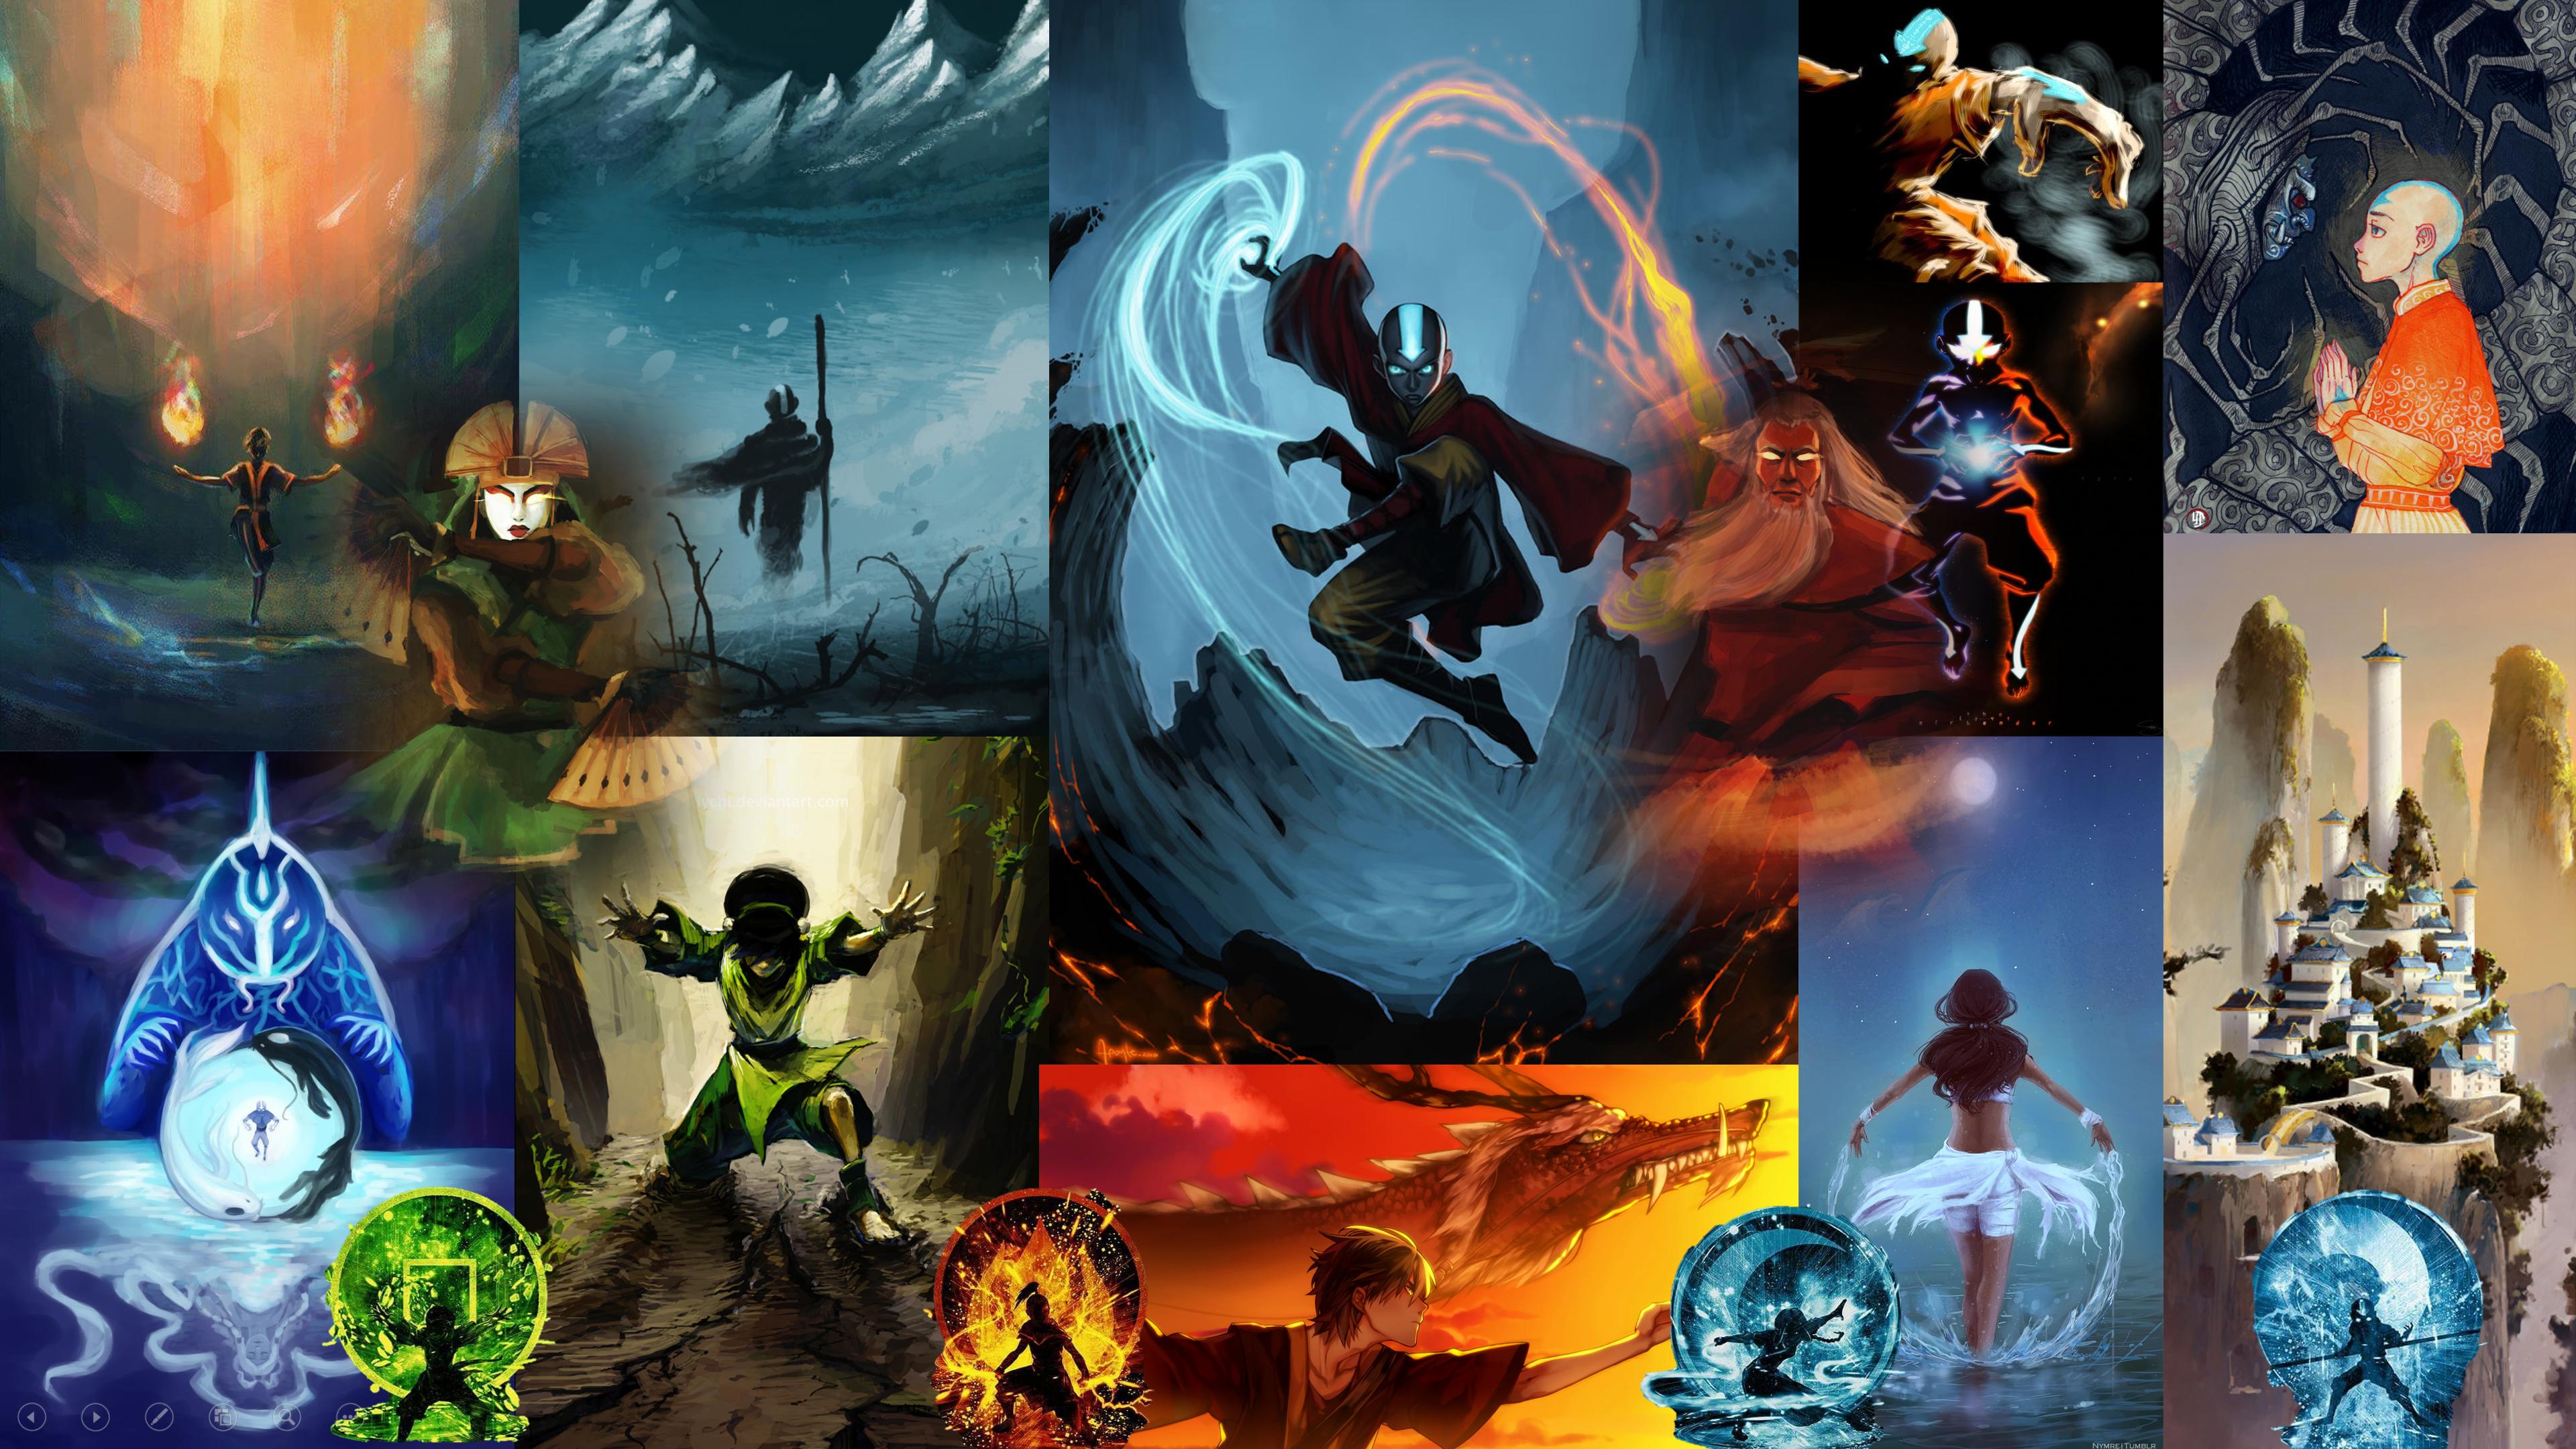 Avatar The Last Airbender Wallpaper 3840 X 2160 In 2020 Avatar The Last Airbender Avatar Poster The Last Airbender